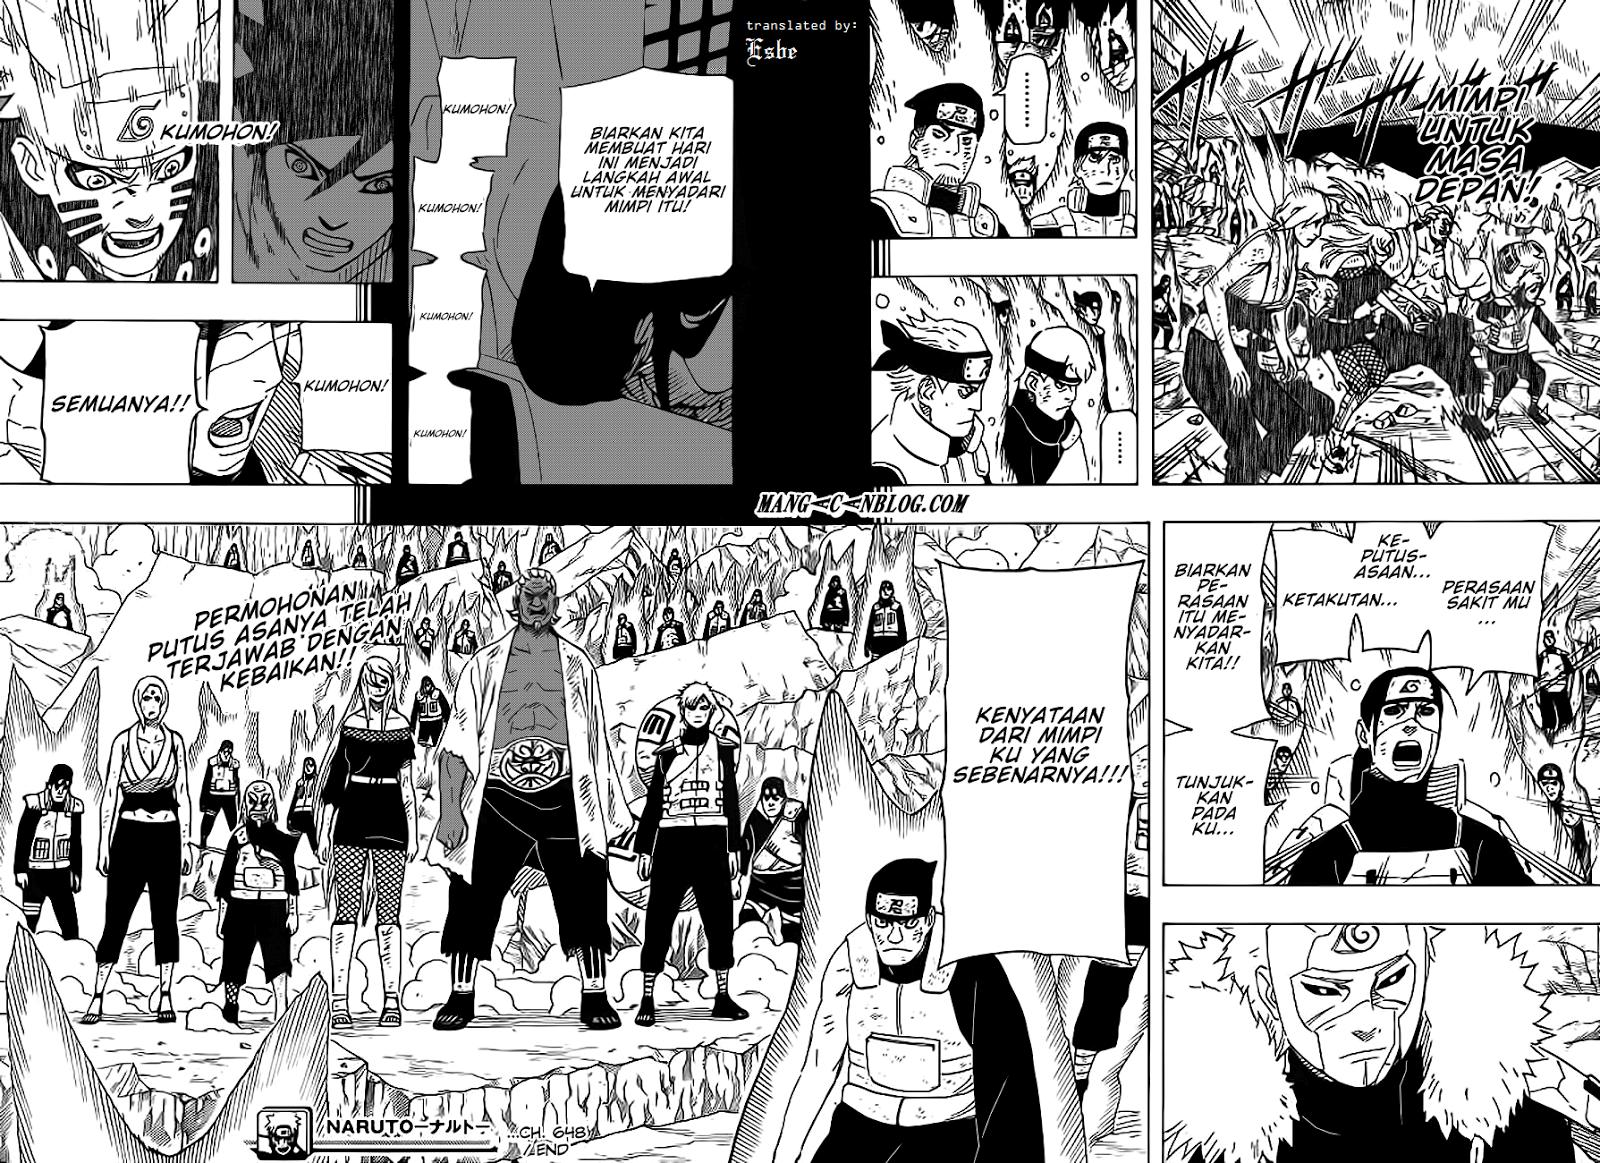 Dilarang COPAS - situs resmi www.mangacanblog.com - Komik naruto 648 - impian seorang shinobi 649 Indonesia naruto 648 - impian seorang shinobi Terbaru 12|Baca Manga Komik Indonesia|Mangacan